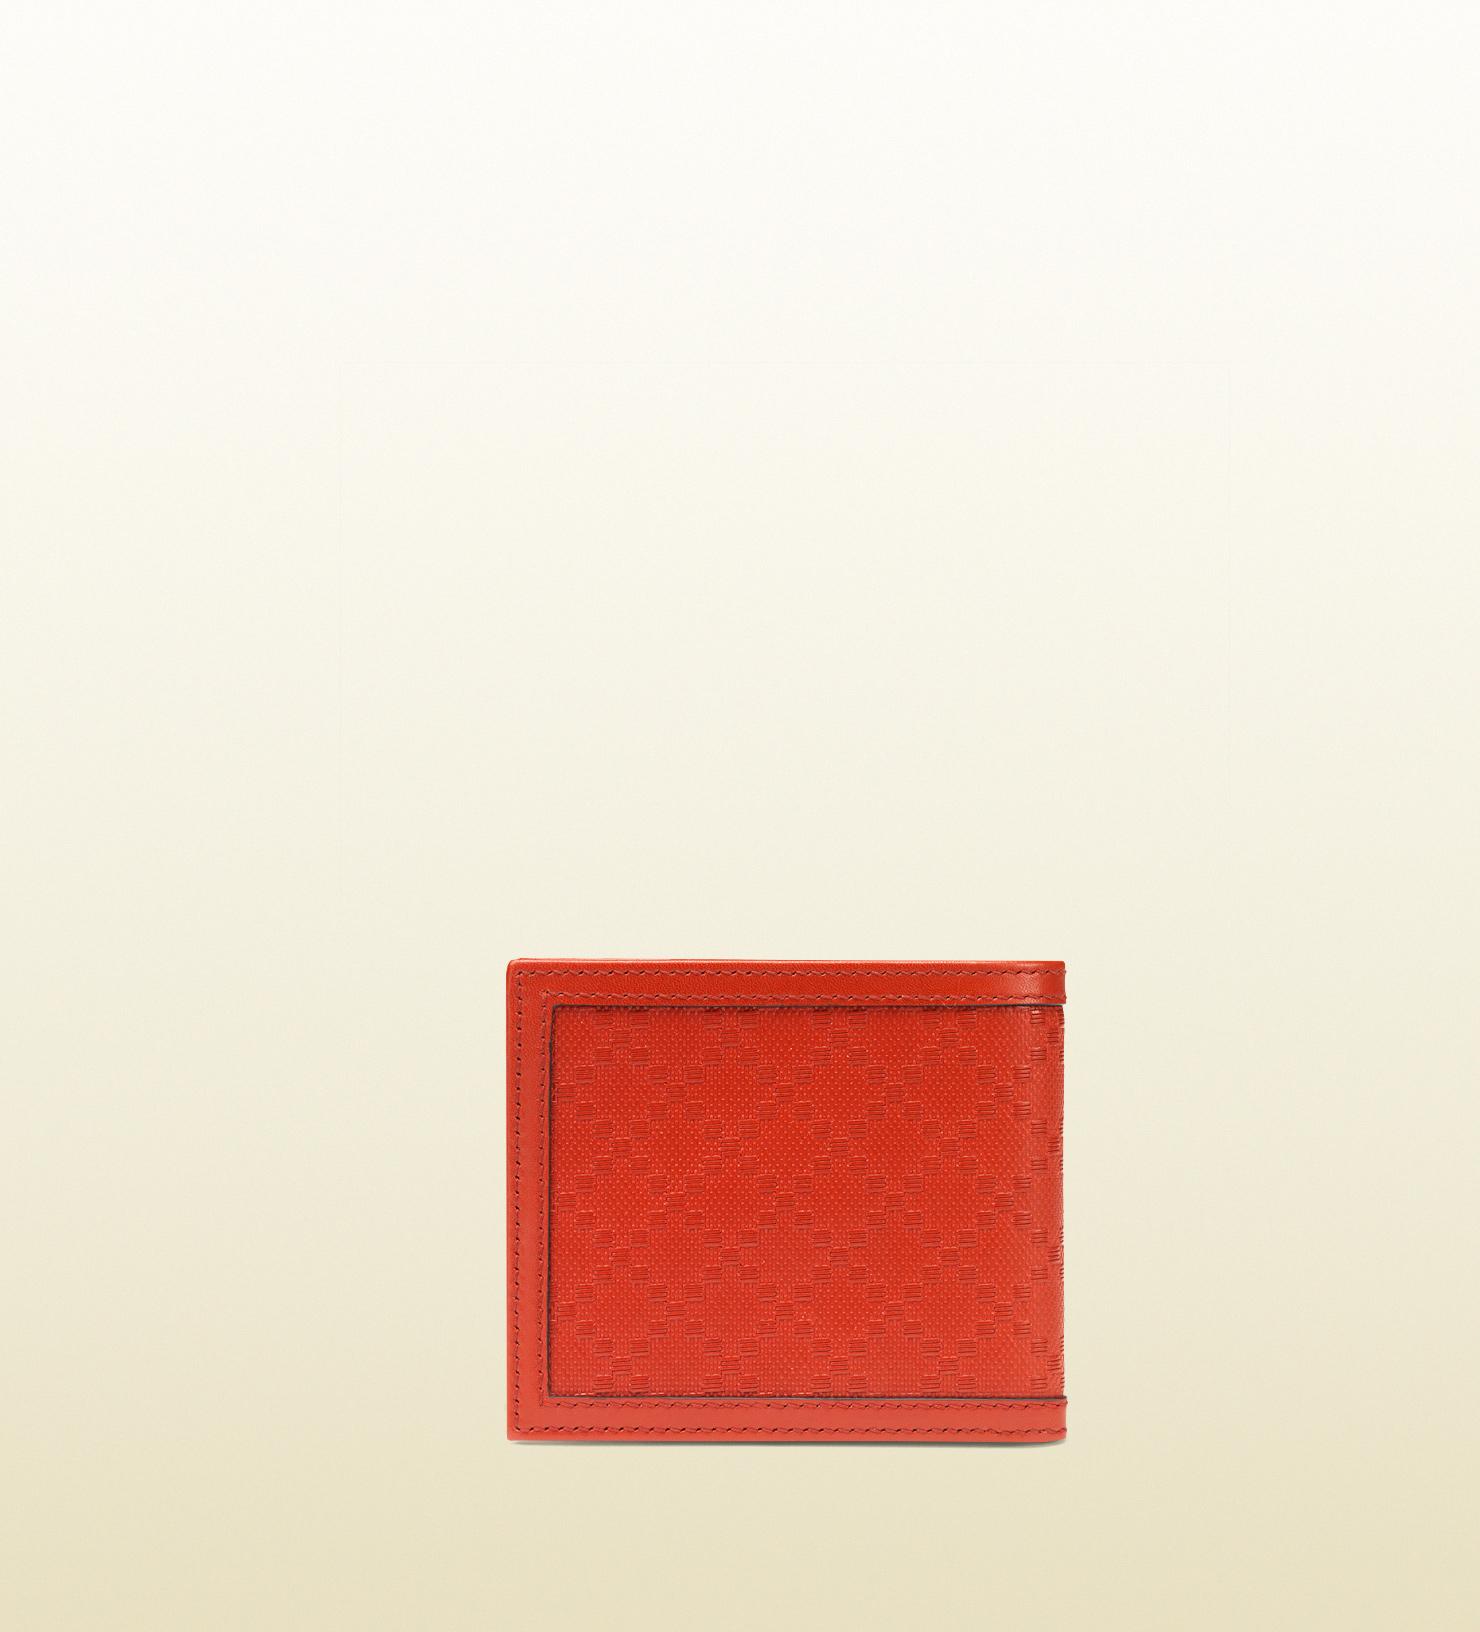 5d33fcfda63 Gucci Diamante Wallet - Best Photo Wallet Justiceforkenny.Org